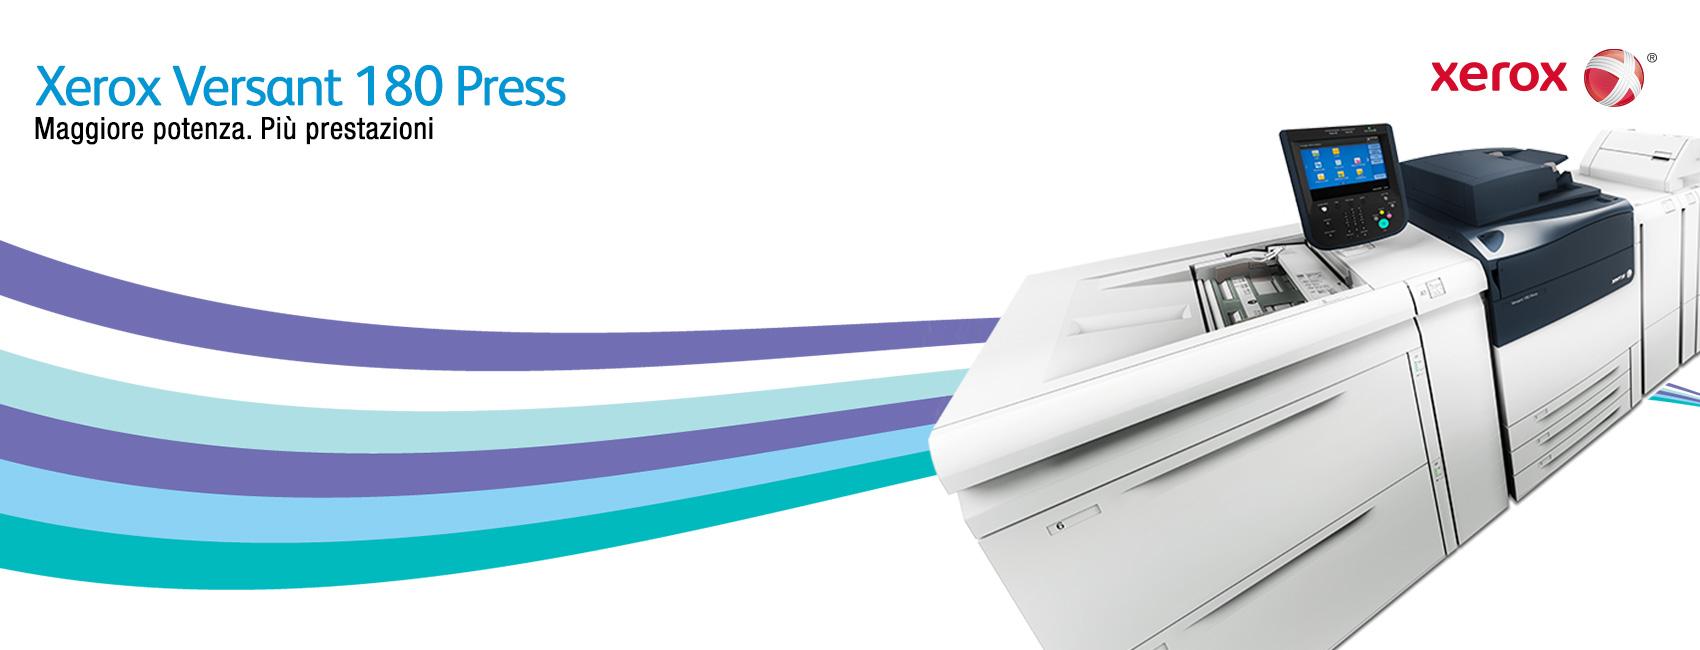 Scoprire la nuova Xerox Versant 180